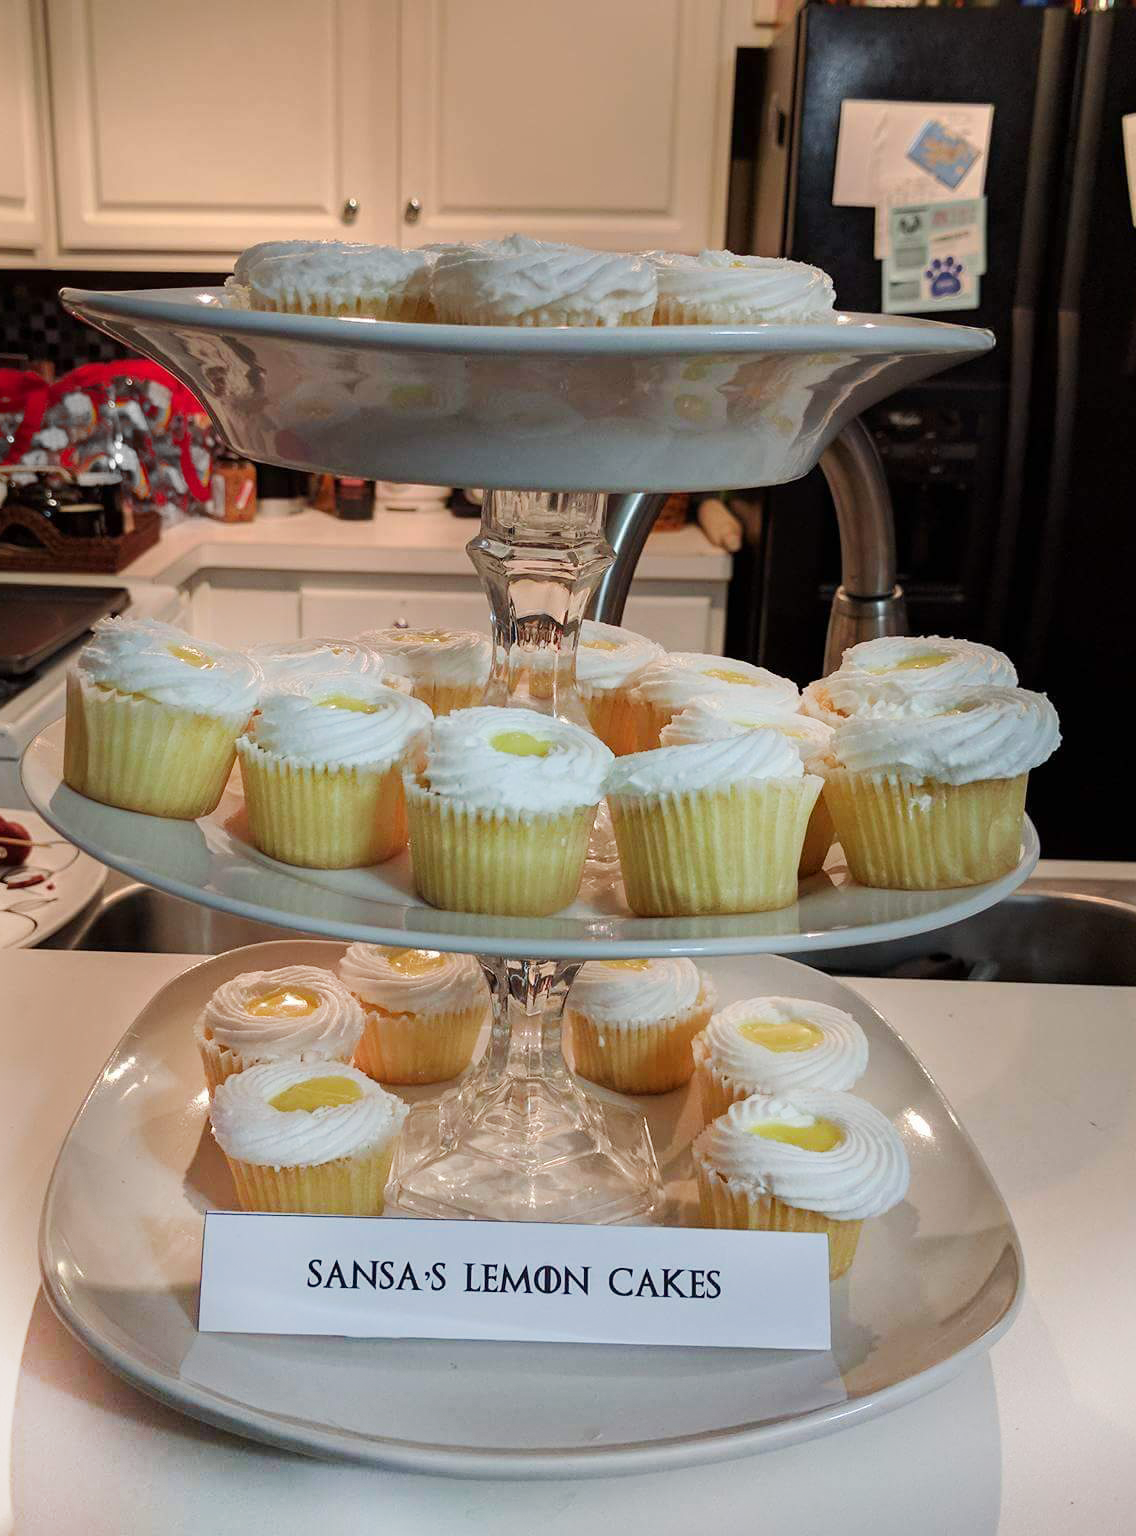 Game of Thrones food sansa lemon cakes